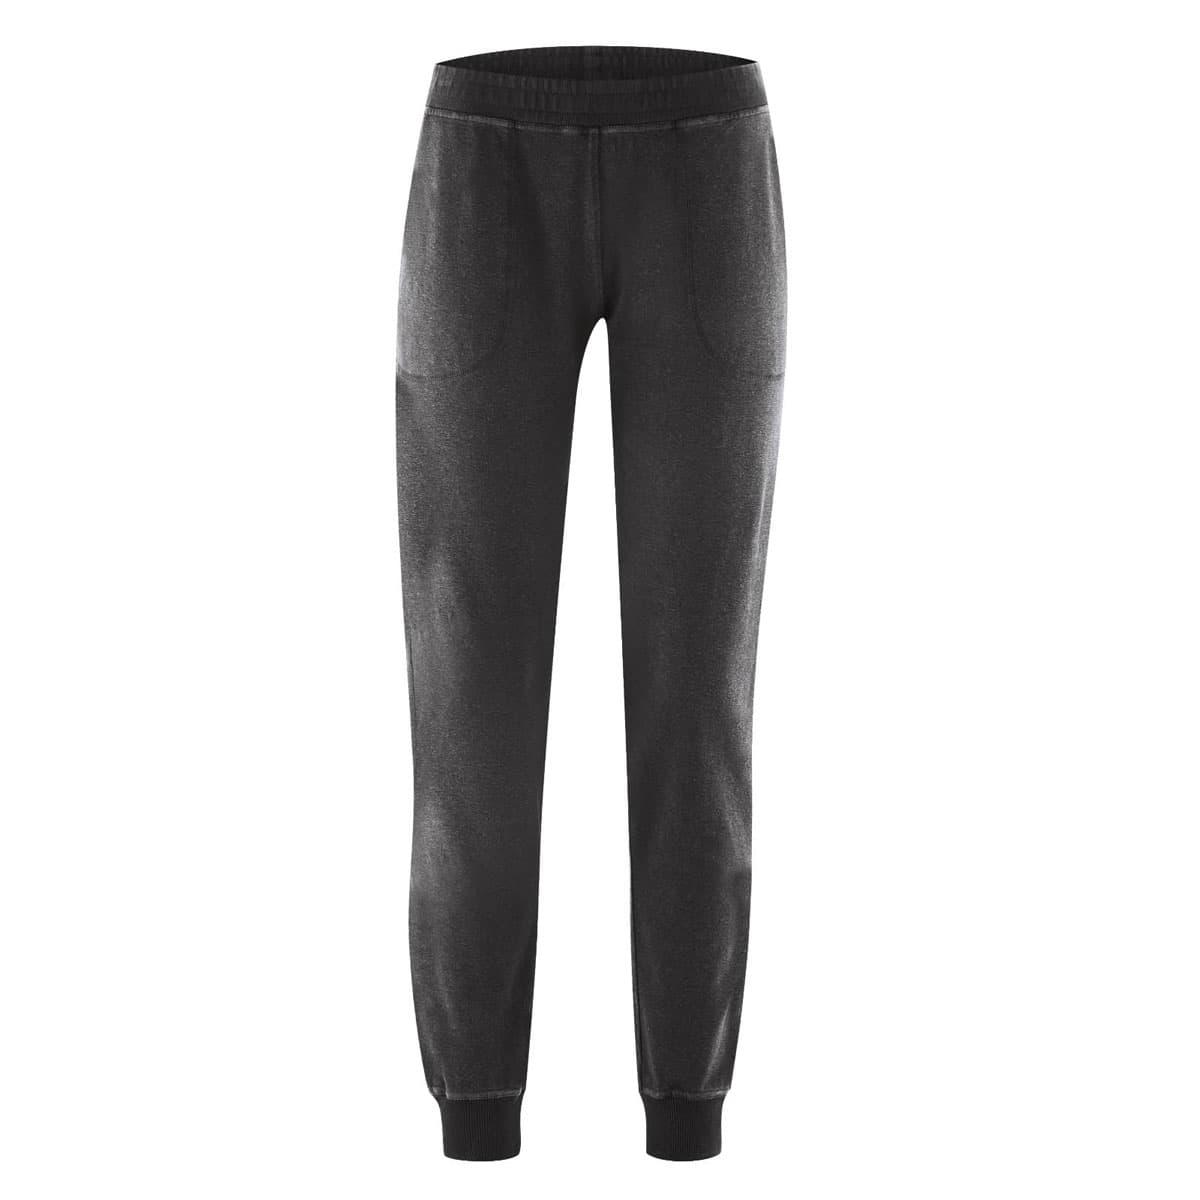 Pantalones yoga mujer negro